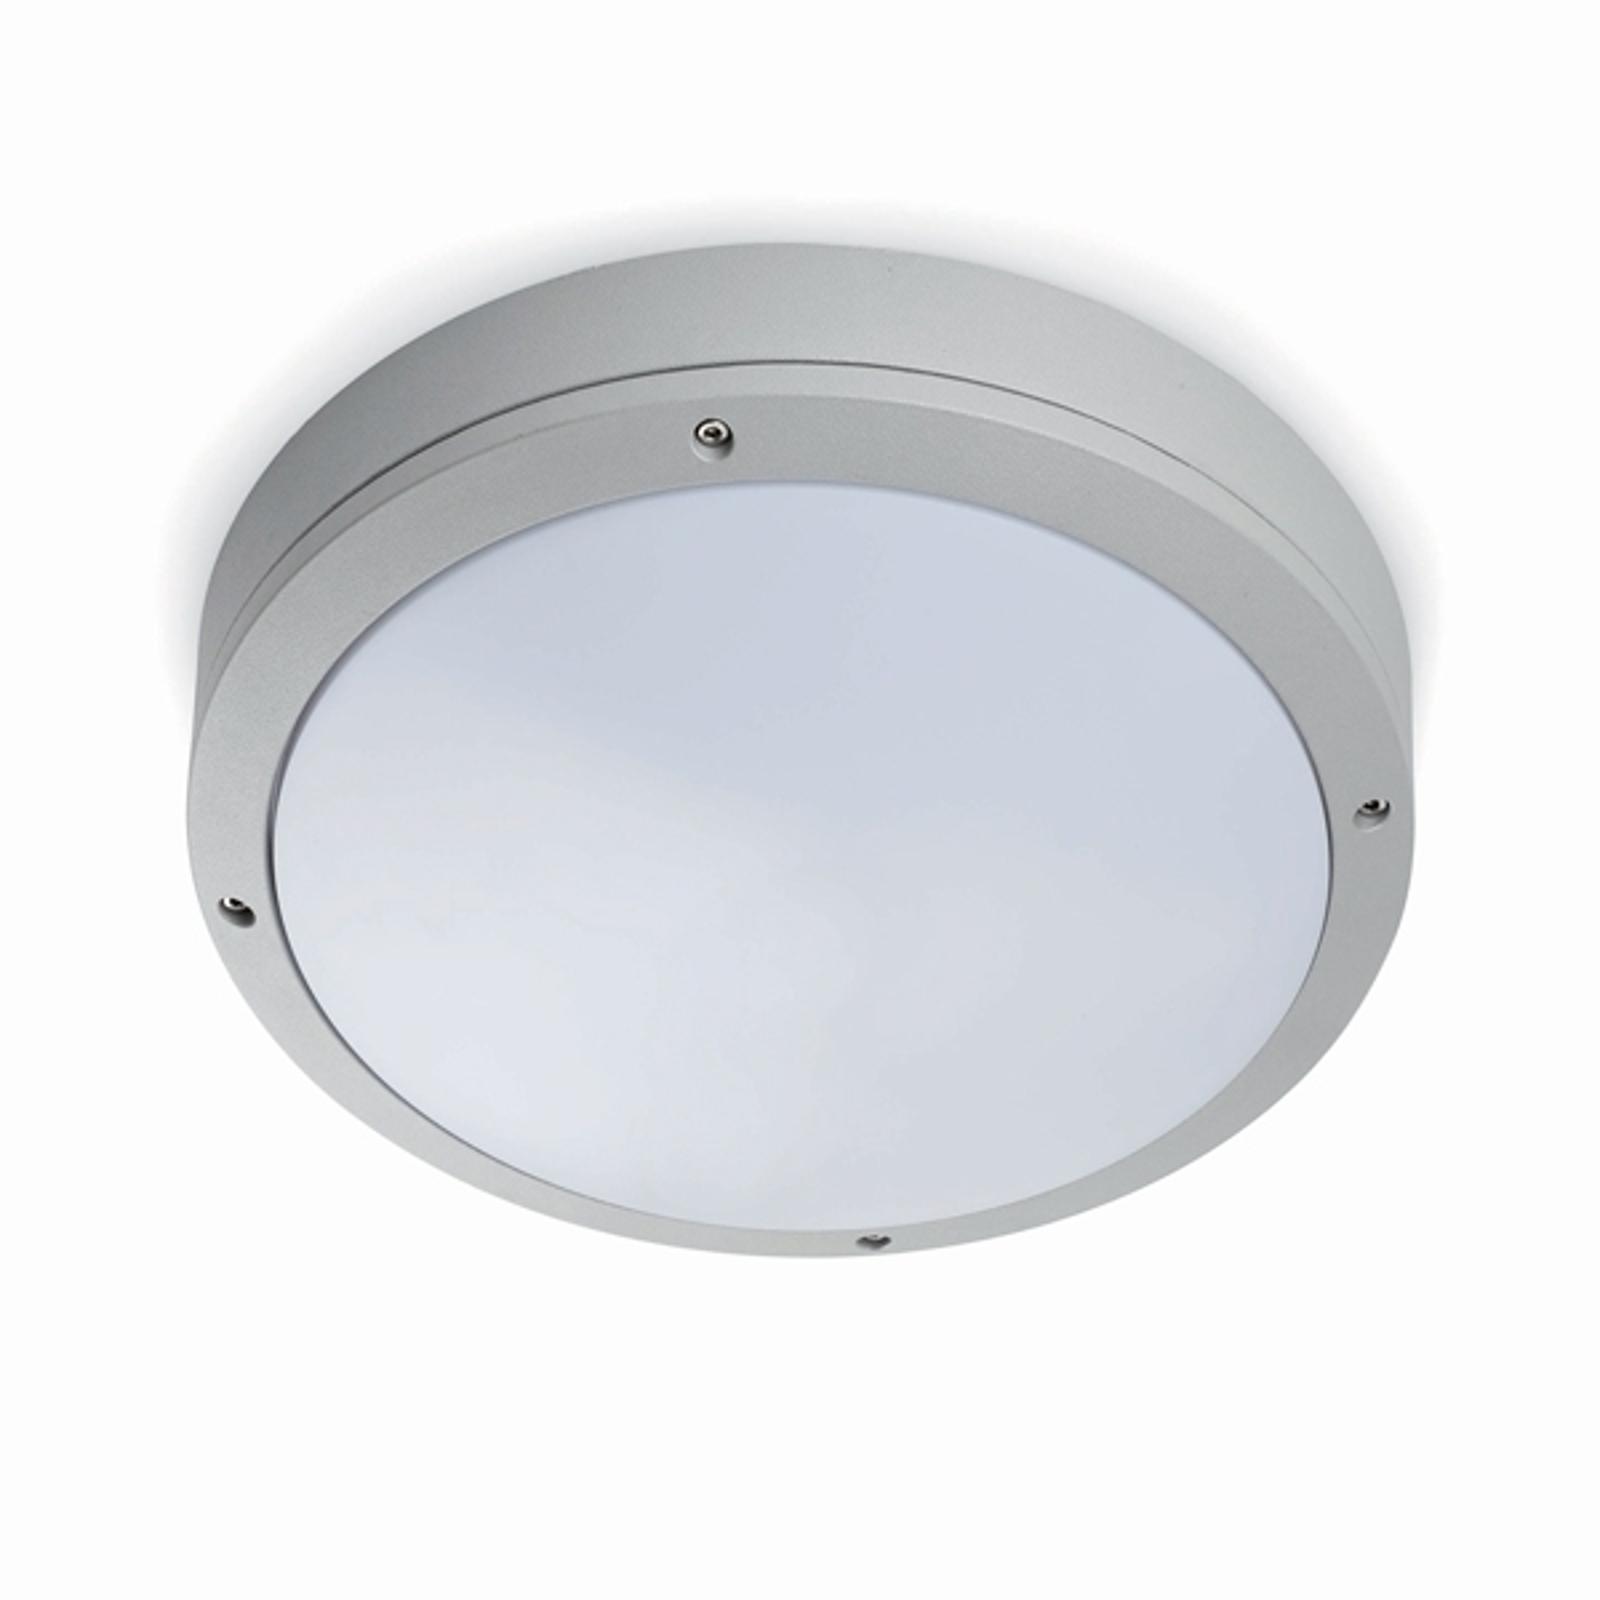 Simpele outdoor plafondlamp Yen